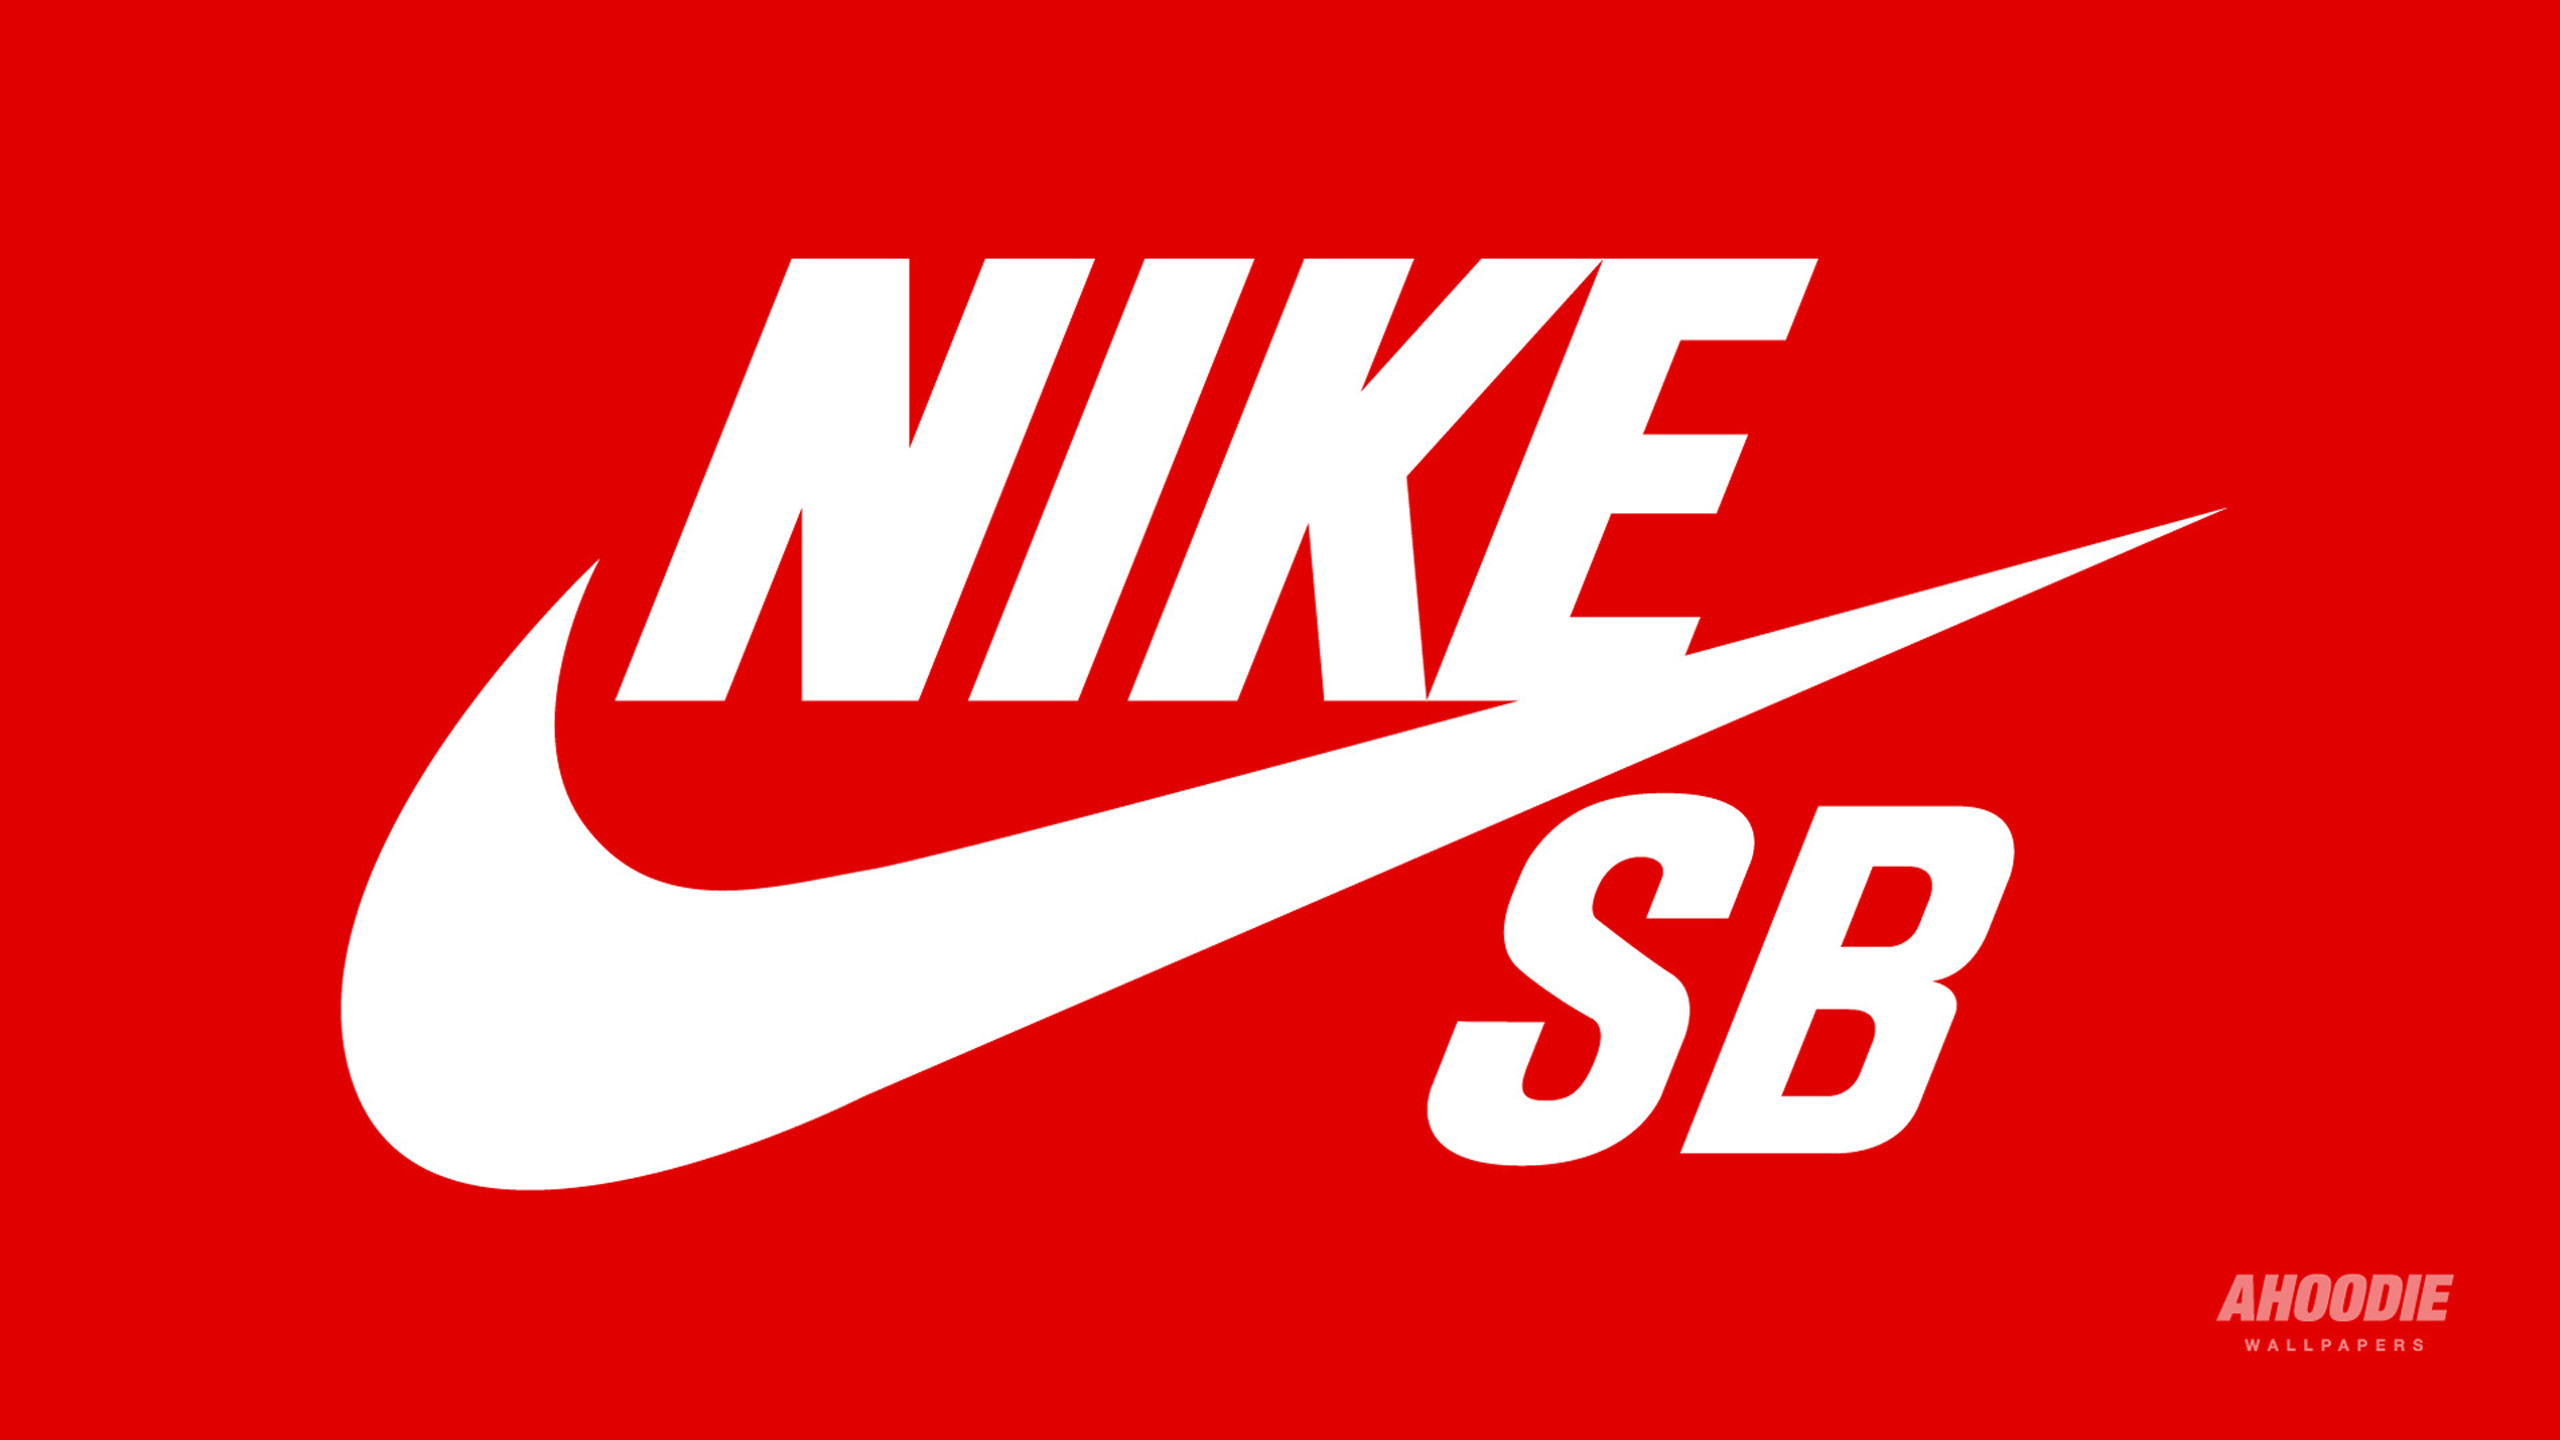 Res: 2560x1440, 0 1920x1200 Nike Wallpapers HD  Nike Wallpapers HD 05, HD Desktop  Wallpapers